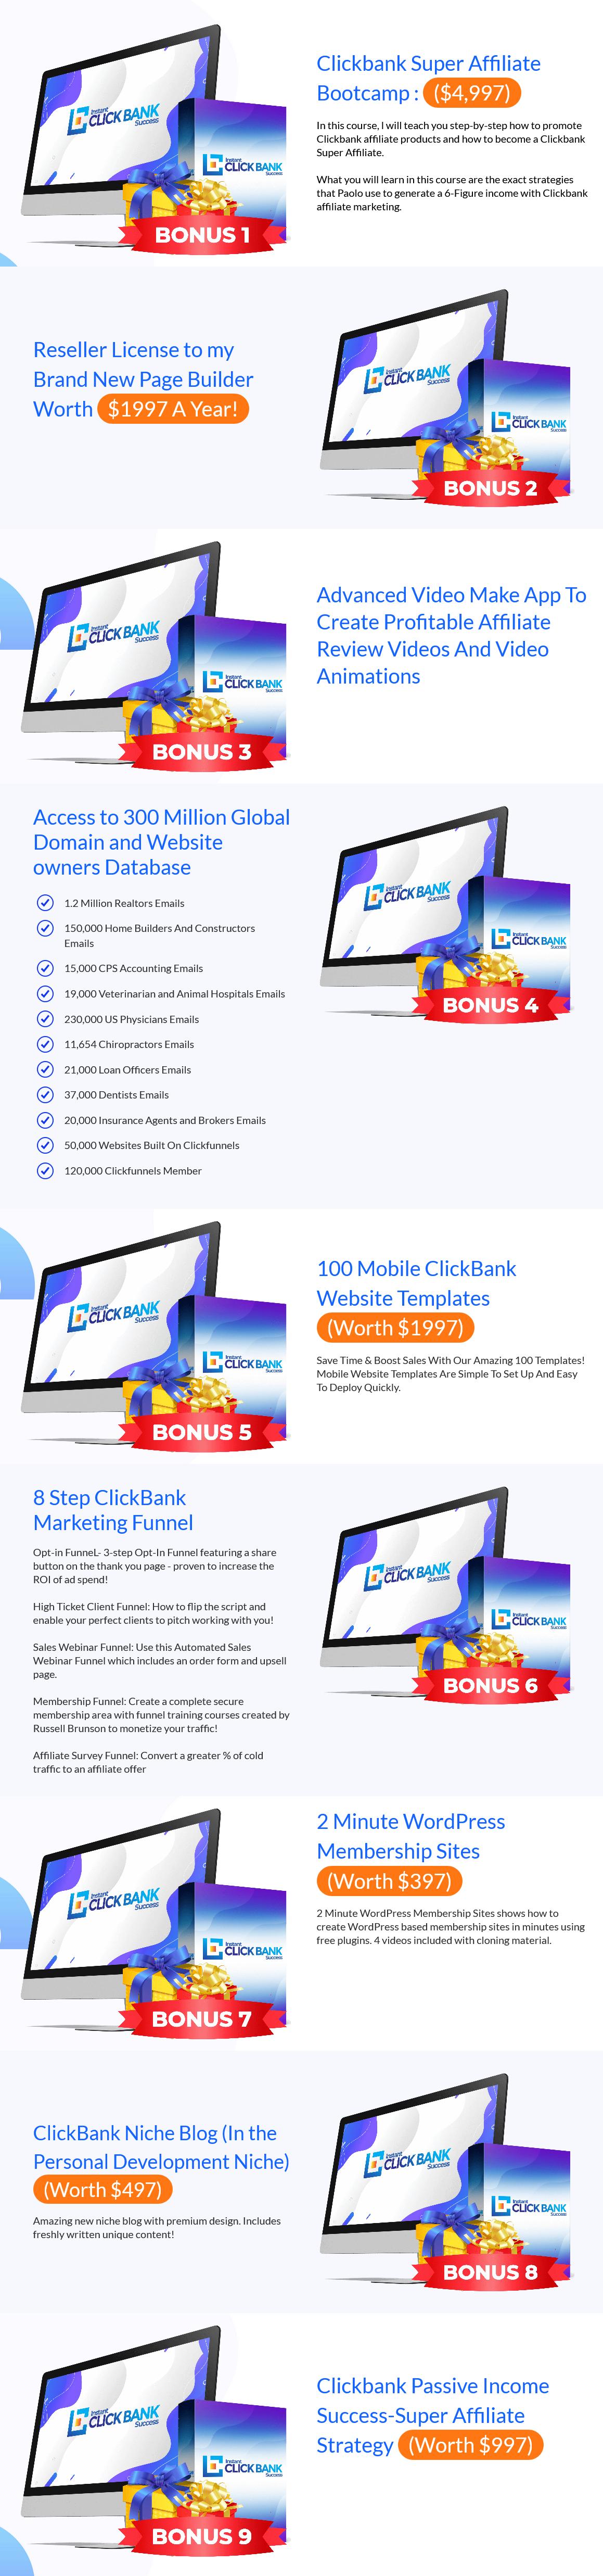 Instant-Clickbank-Success-bonus